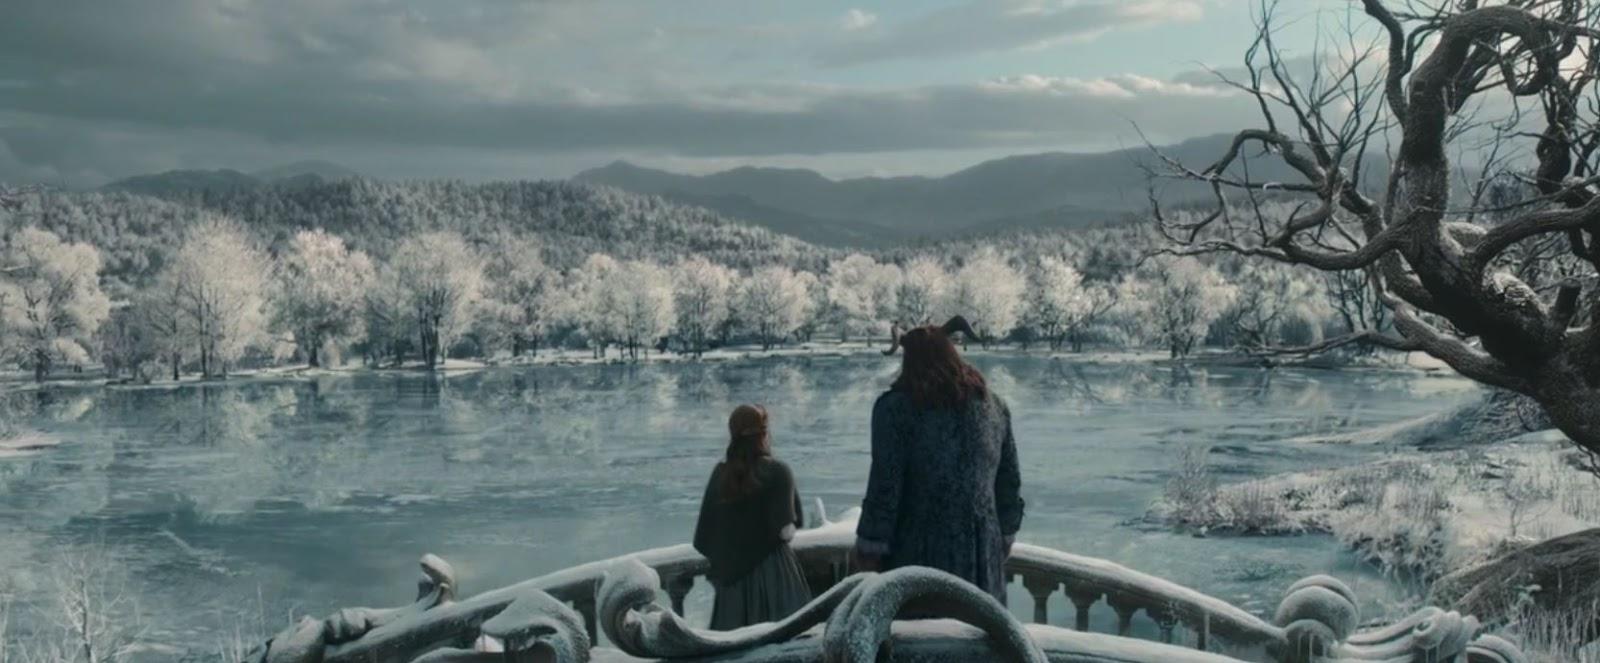 تحميل ومشاهدة فيلم Beauty And The Beast 2017 1080p BluRay مترجم